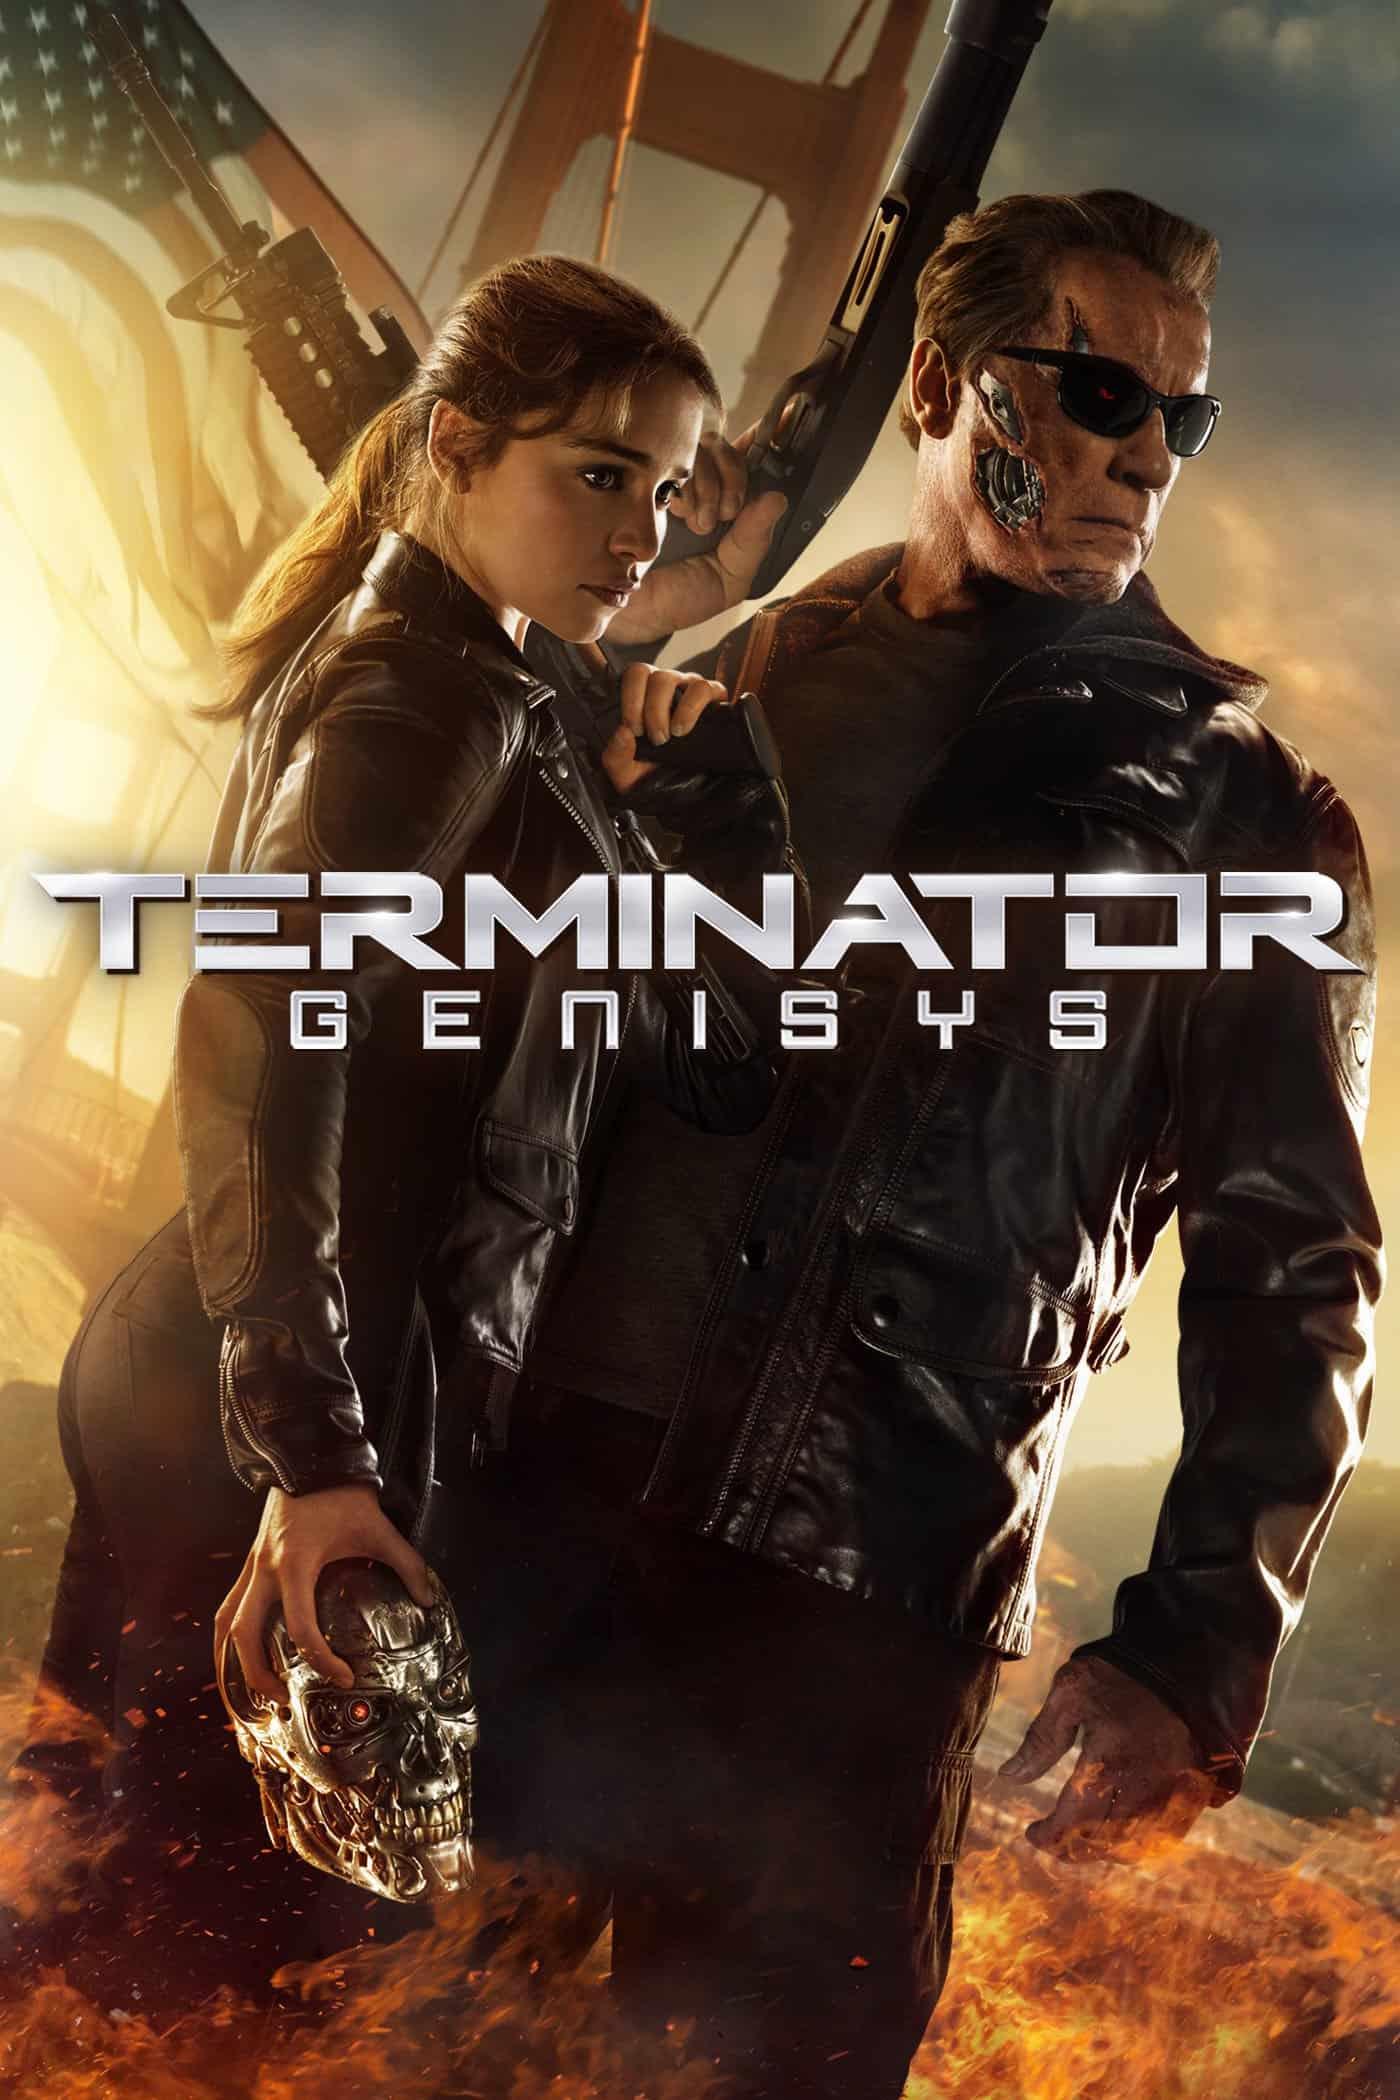 Terminator Genisys, 2015